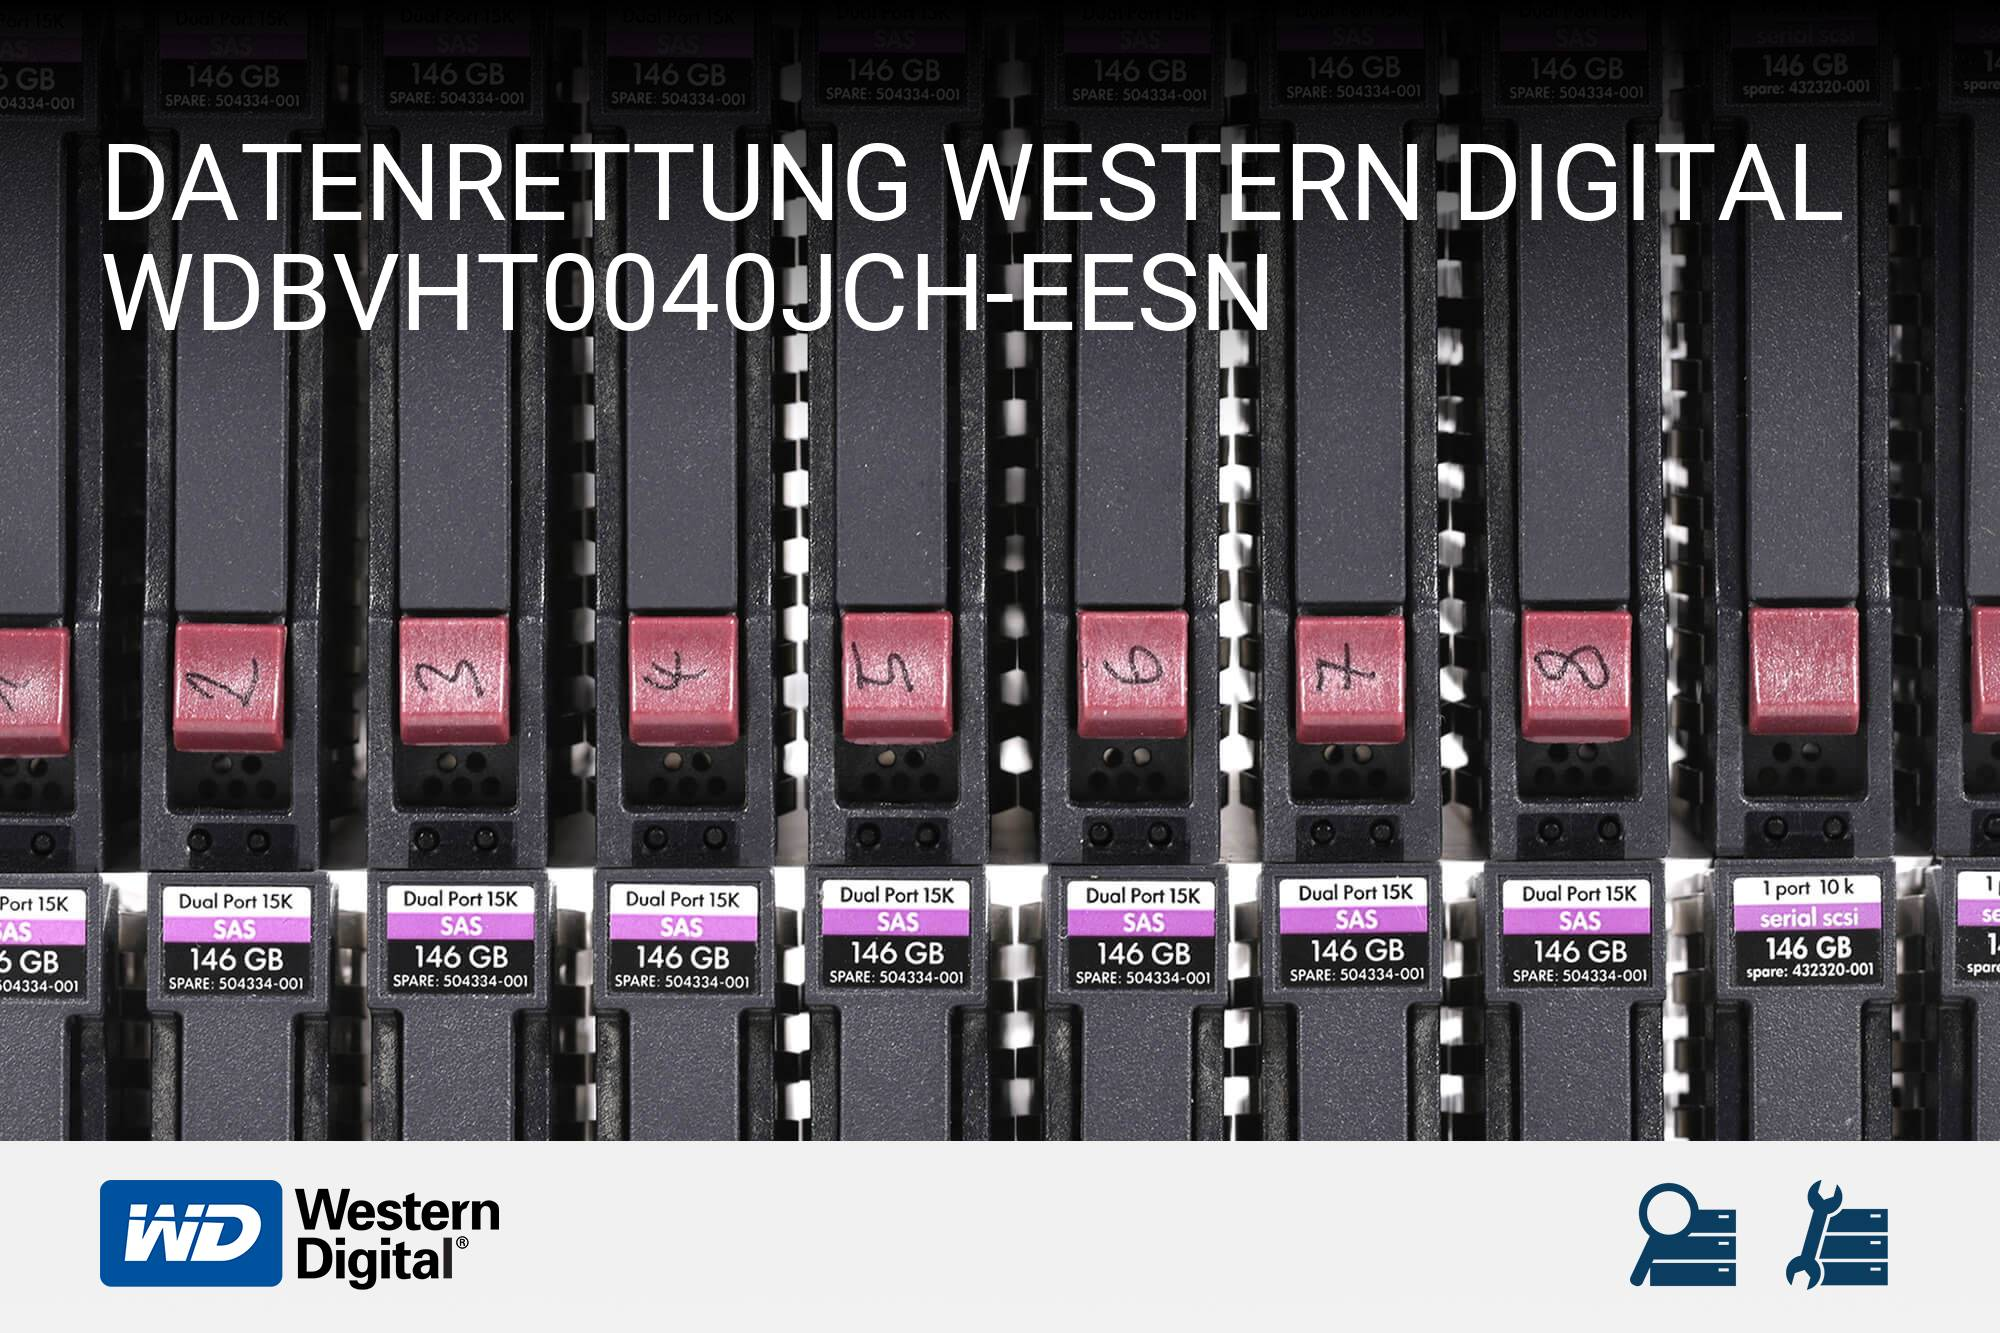 Western Digital WDBVHT0040JCH-EESN